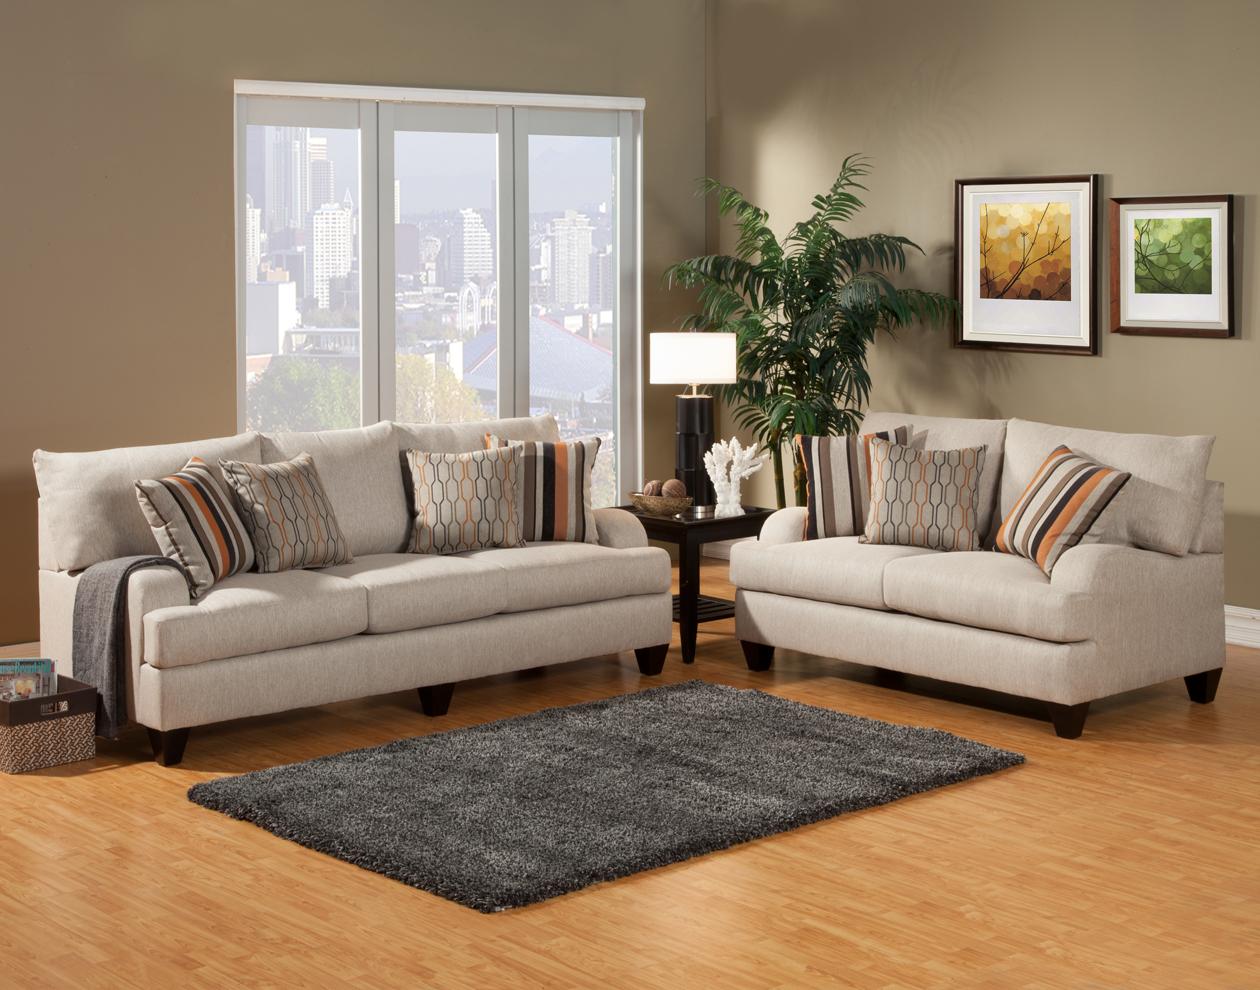 Sofa & Loveseat (Fabric)